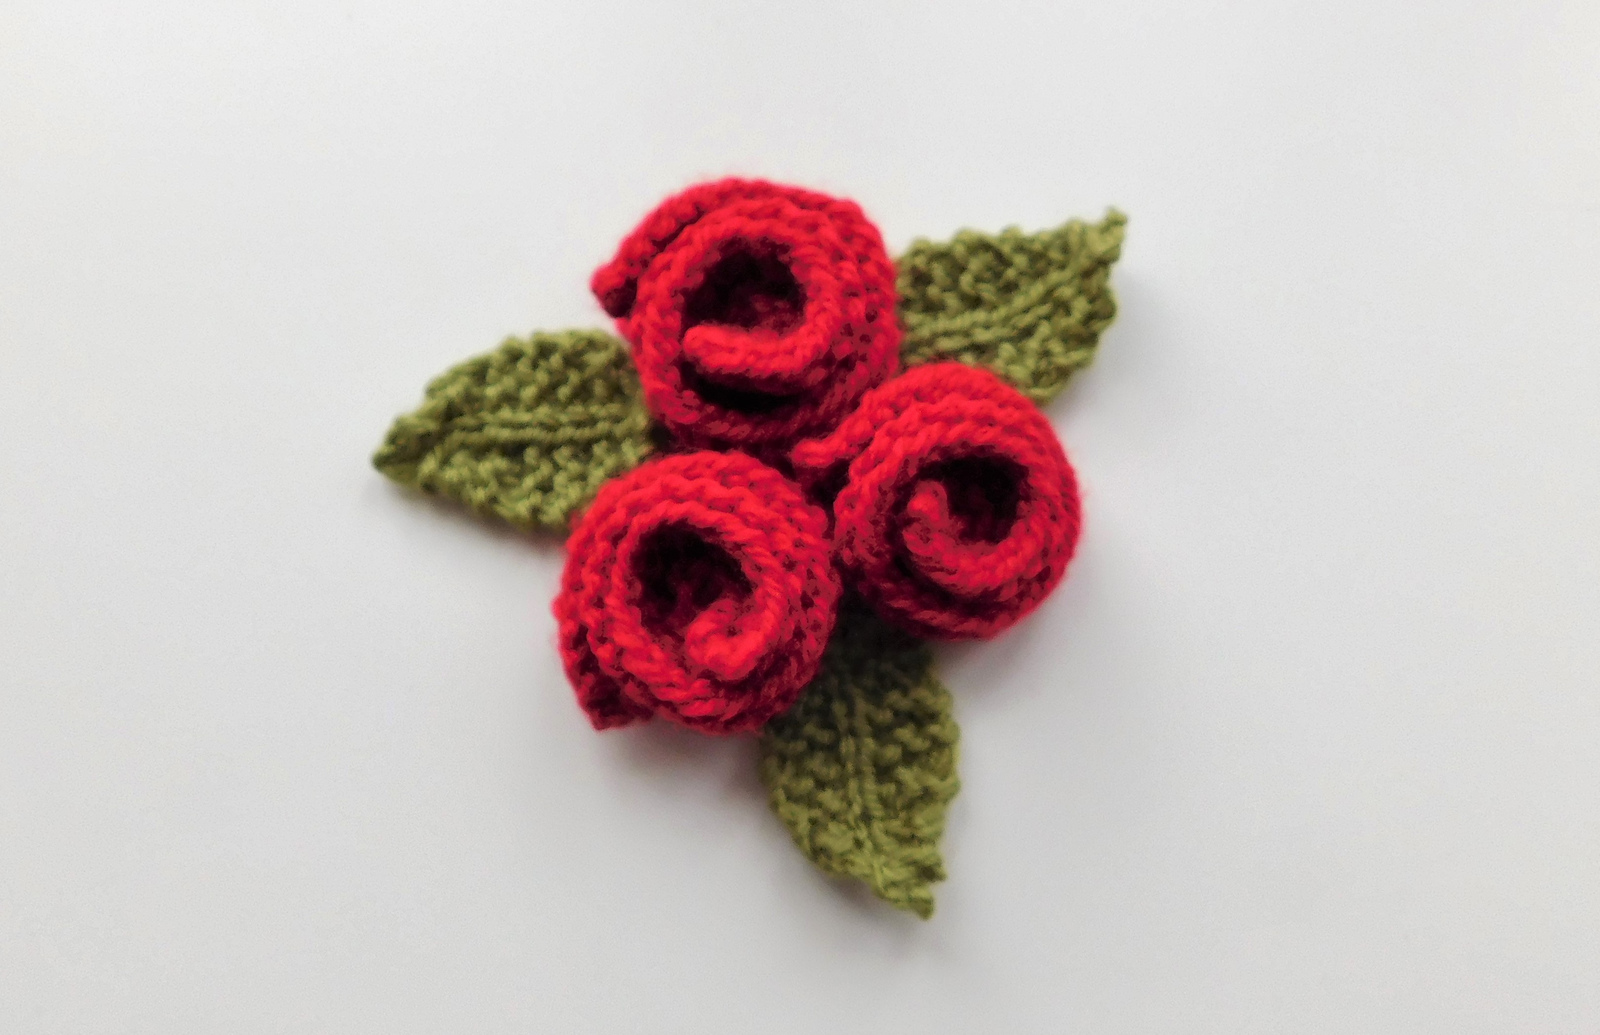 Christmas Knitting Patterns For Ferrero Rocher.Marianna S Lazy Daisy Days Christmas Crafts